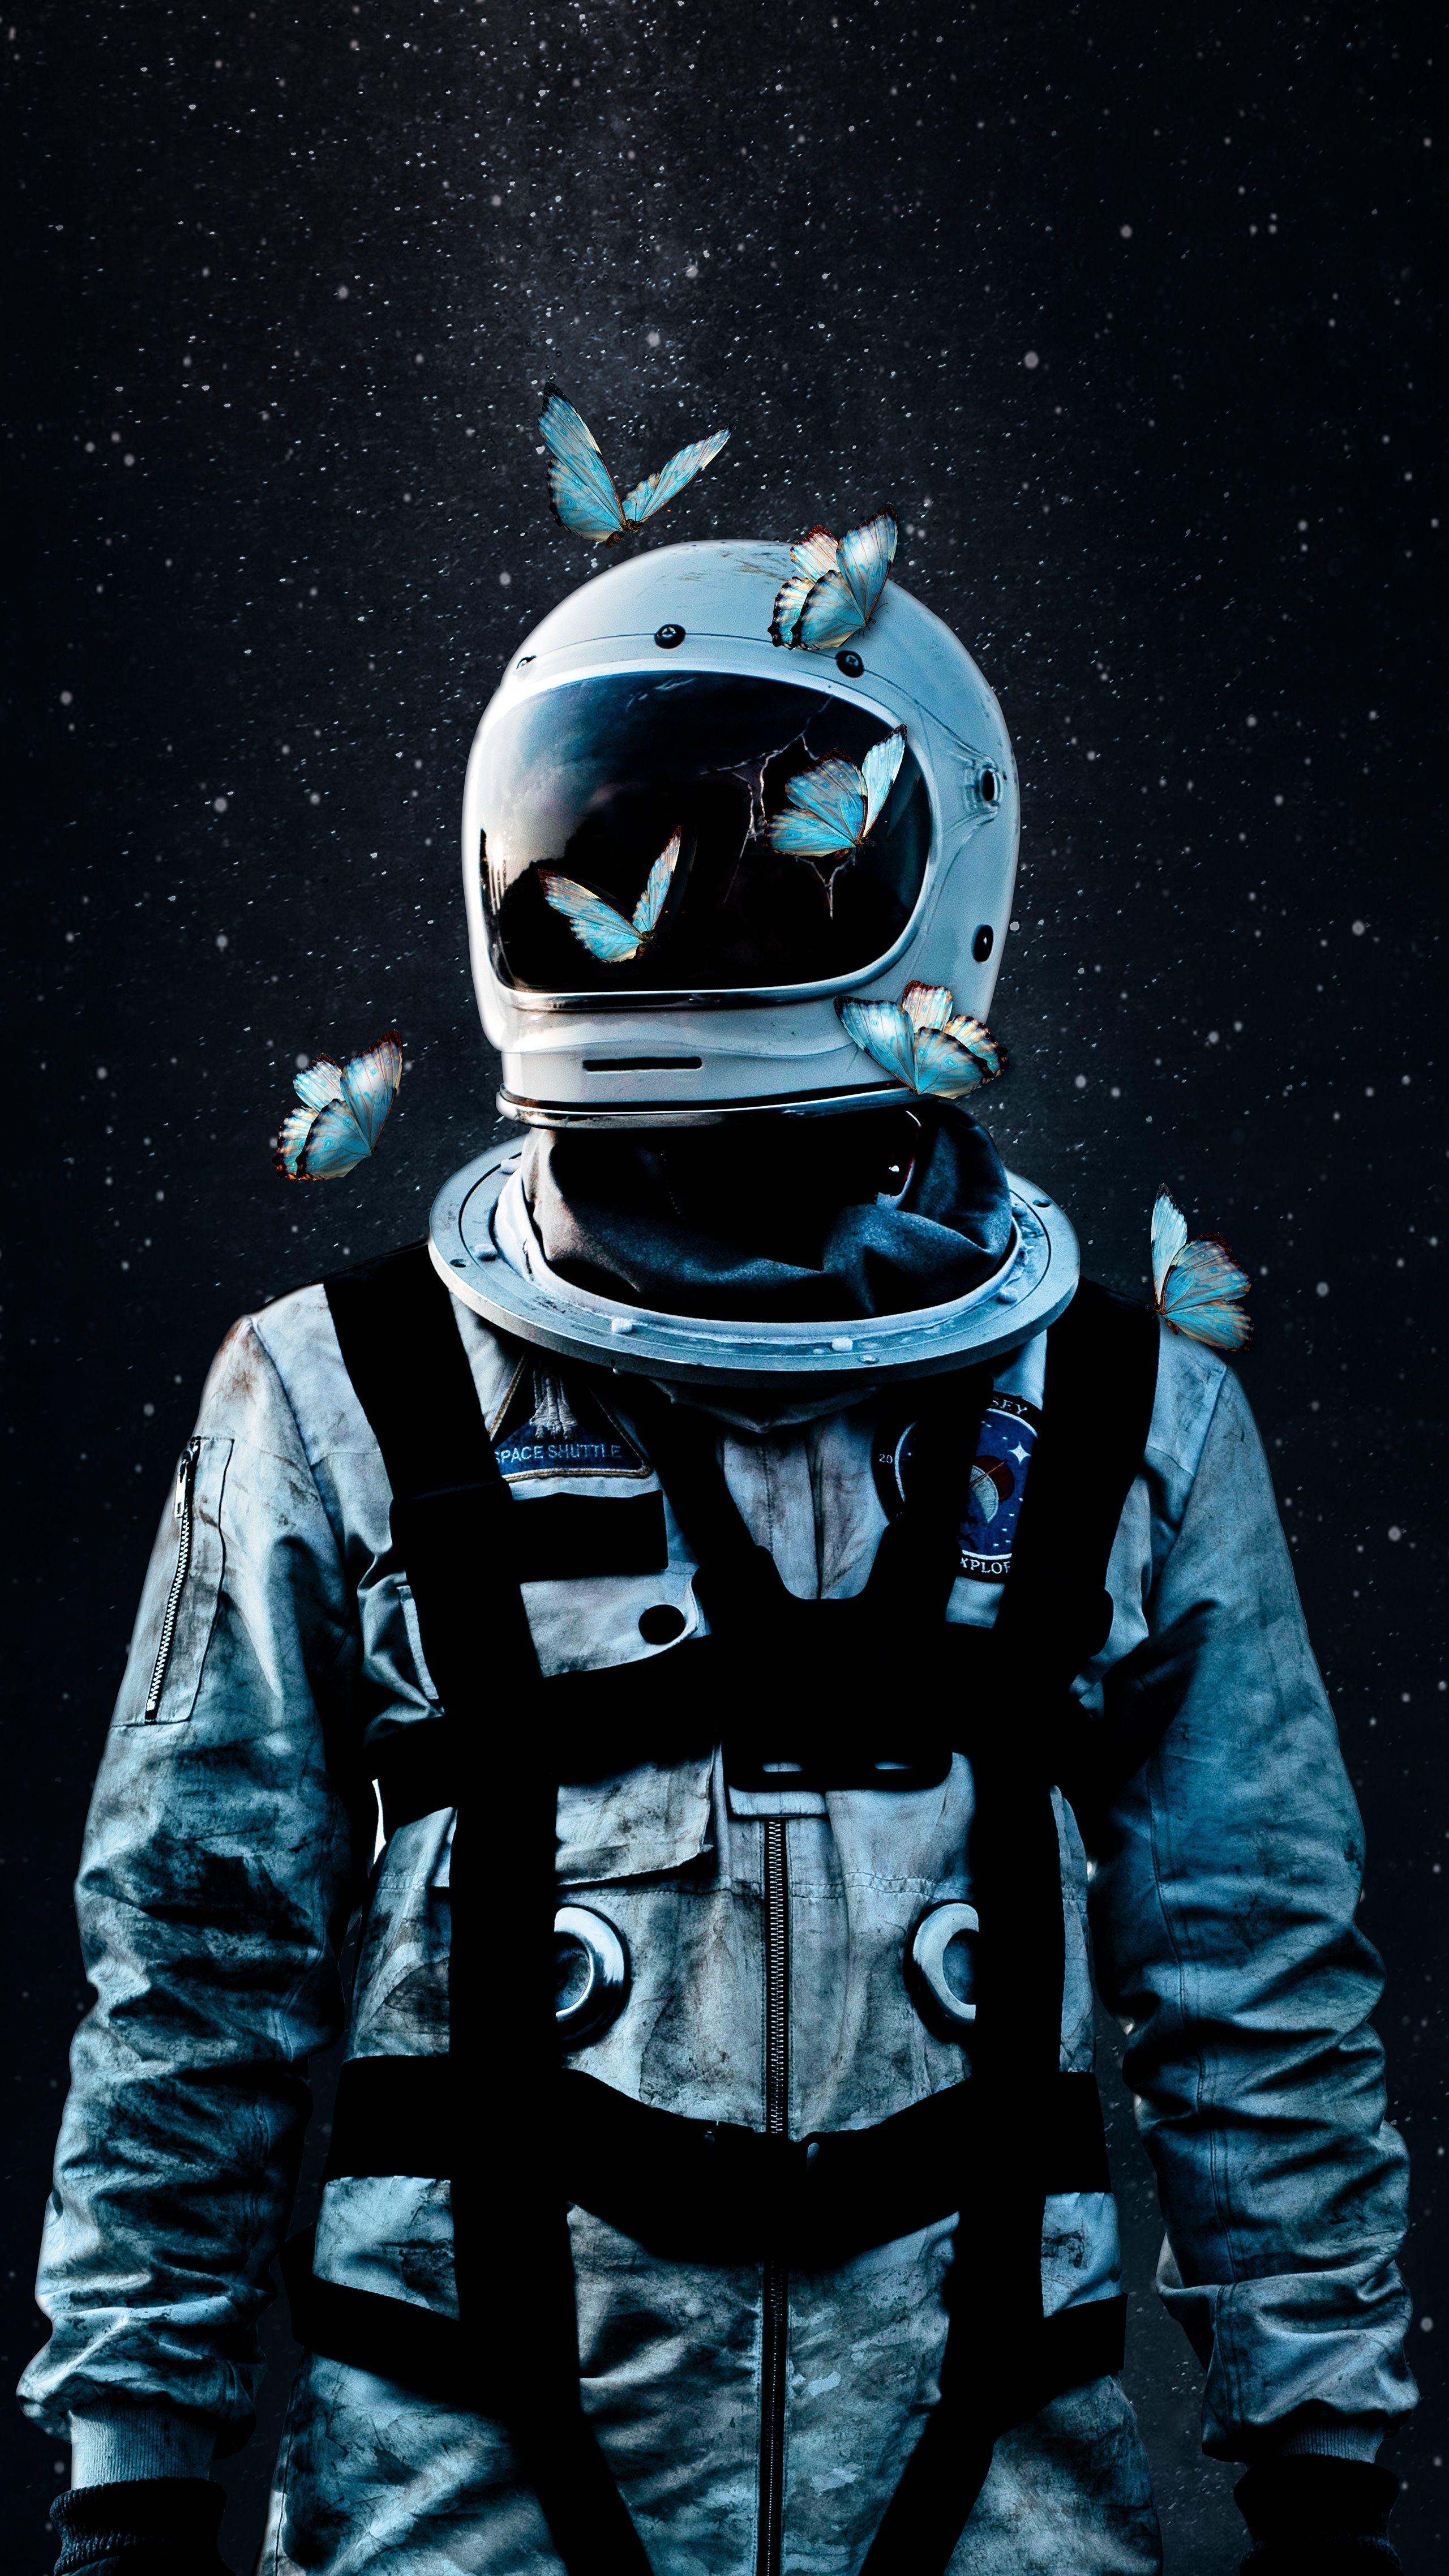 creative space astronaut wallpaper astronaut